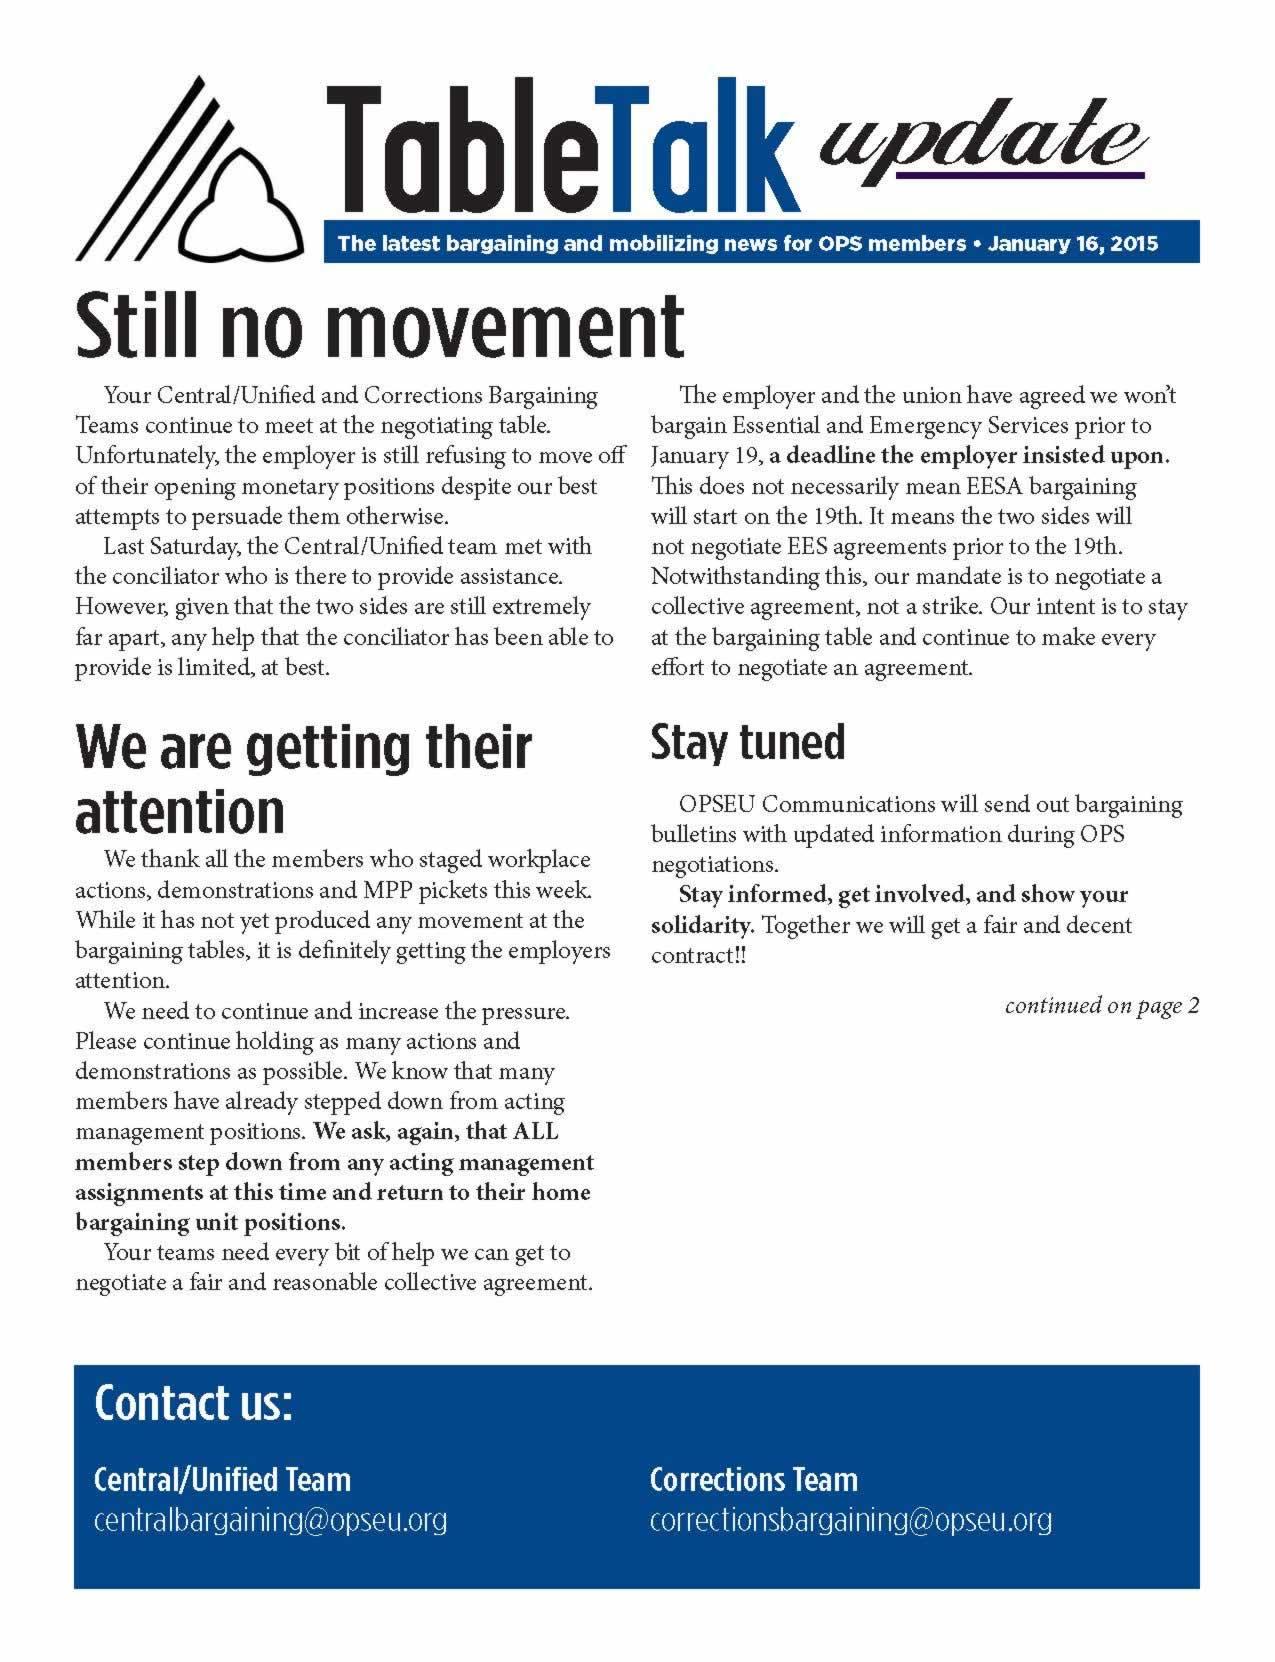 Table Talk Update: Still no movement